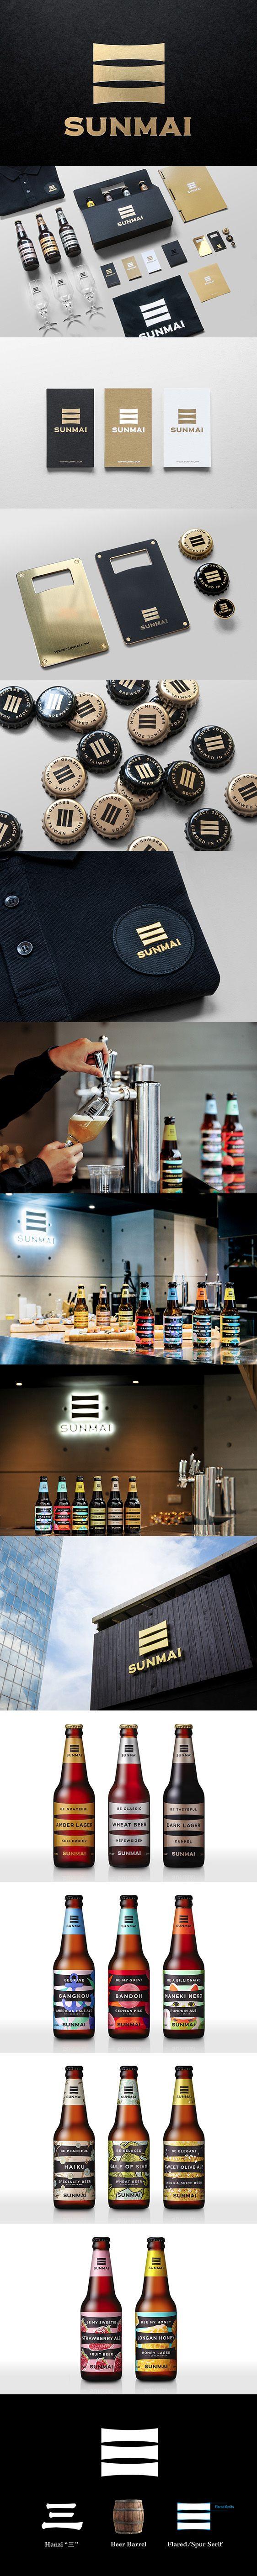 Sunmai Craft Beer Rebranding From Bechance